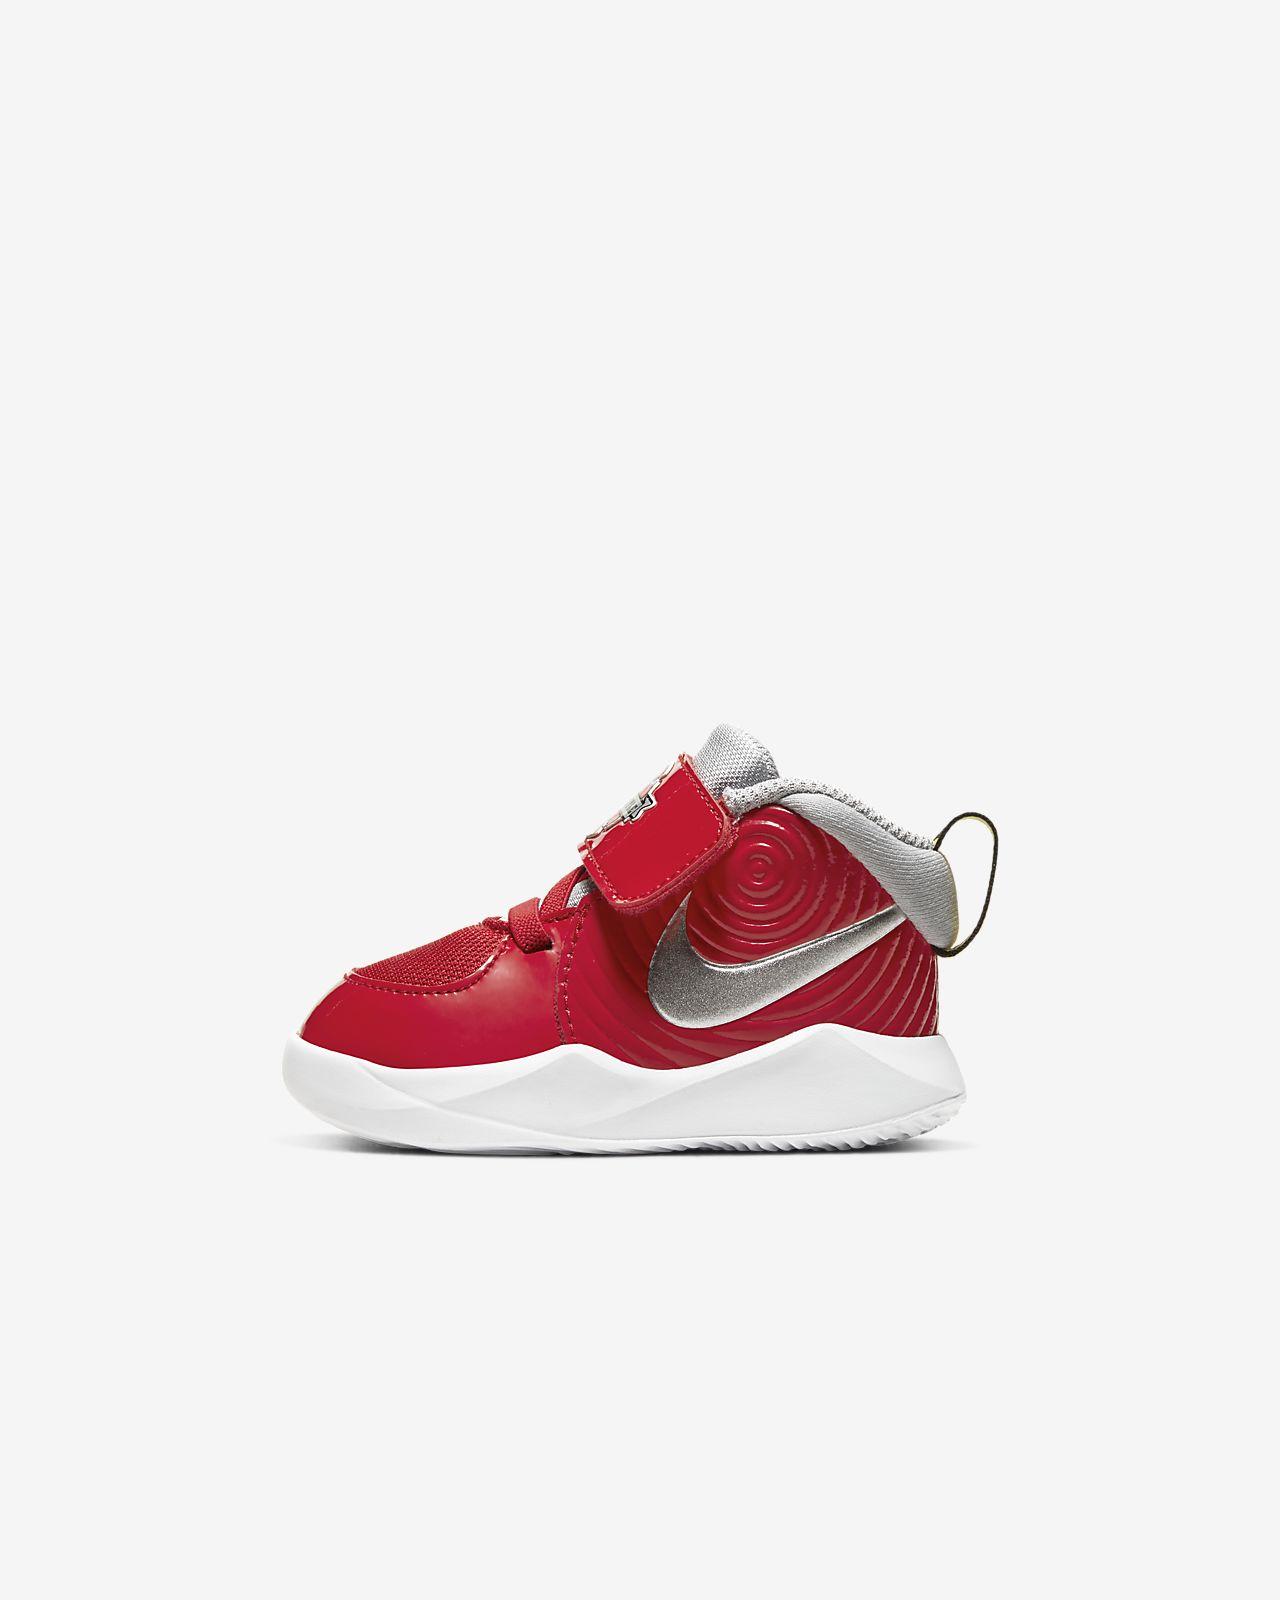 Buty dla maluchów Nike Team Hustle D 9 Auto